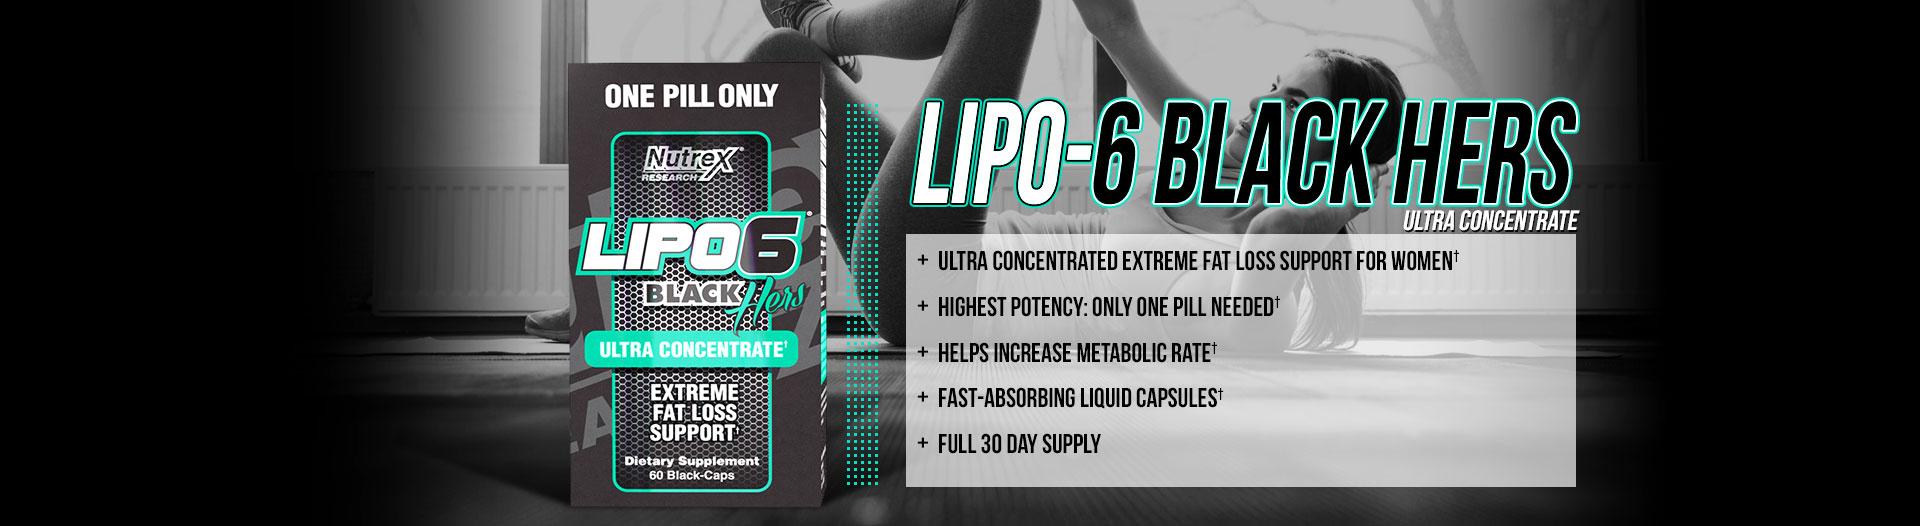 Nutrex Lipo6 Black Hers